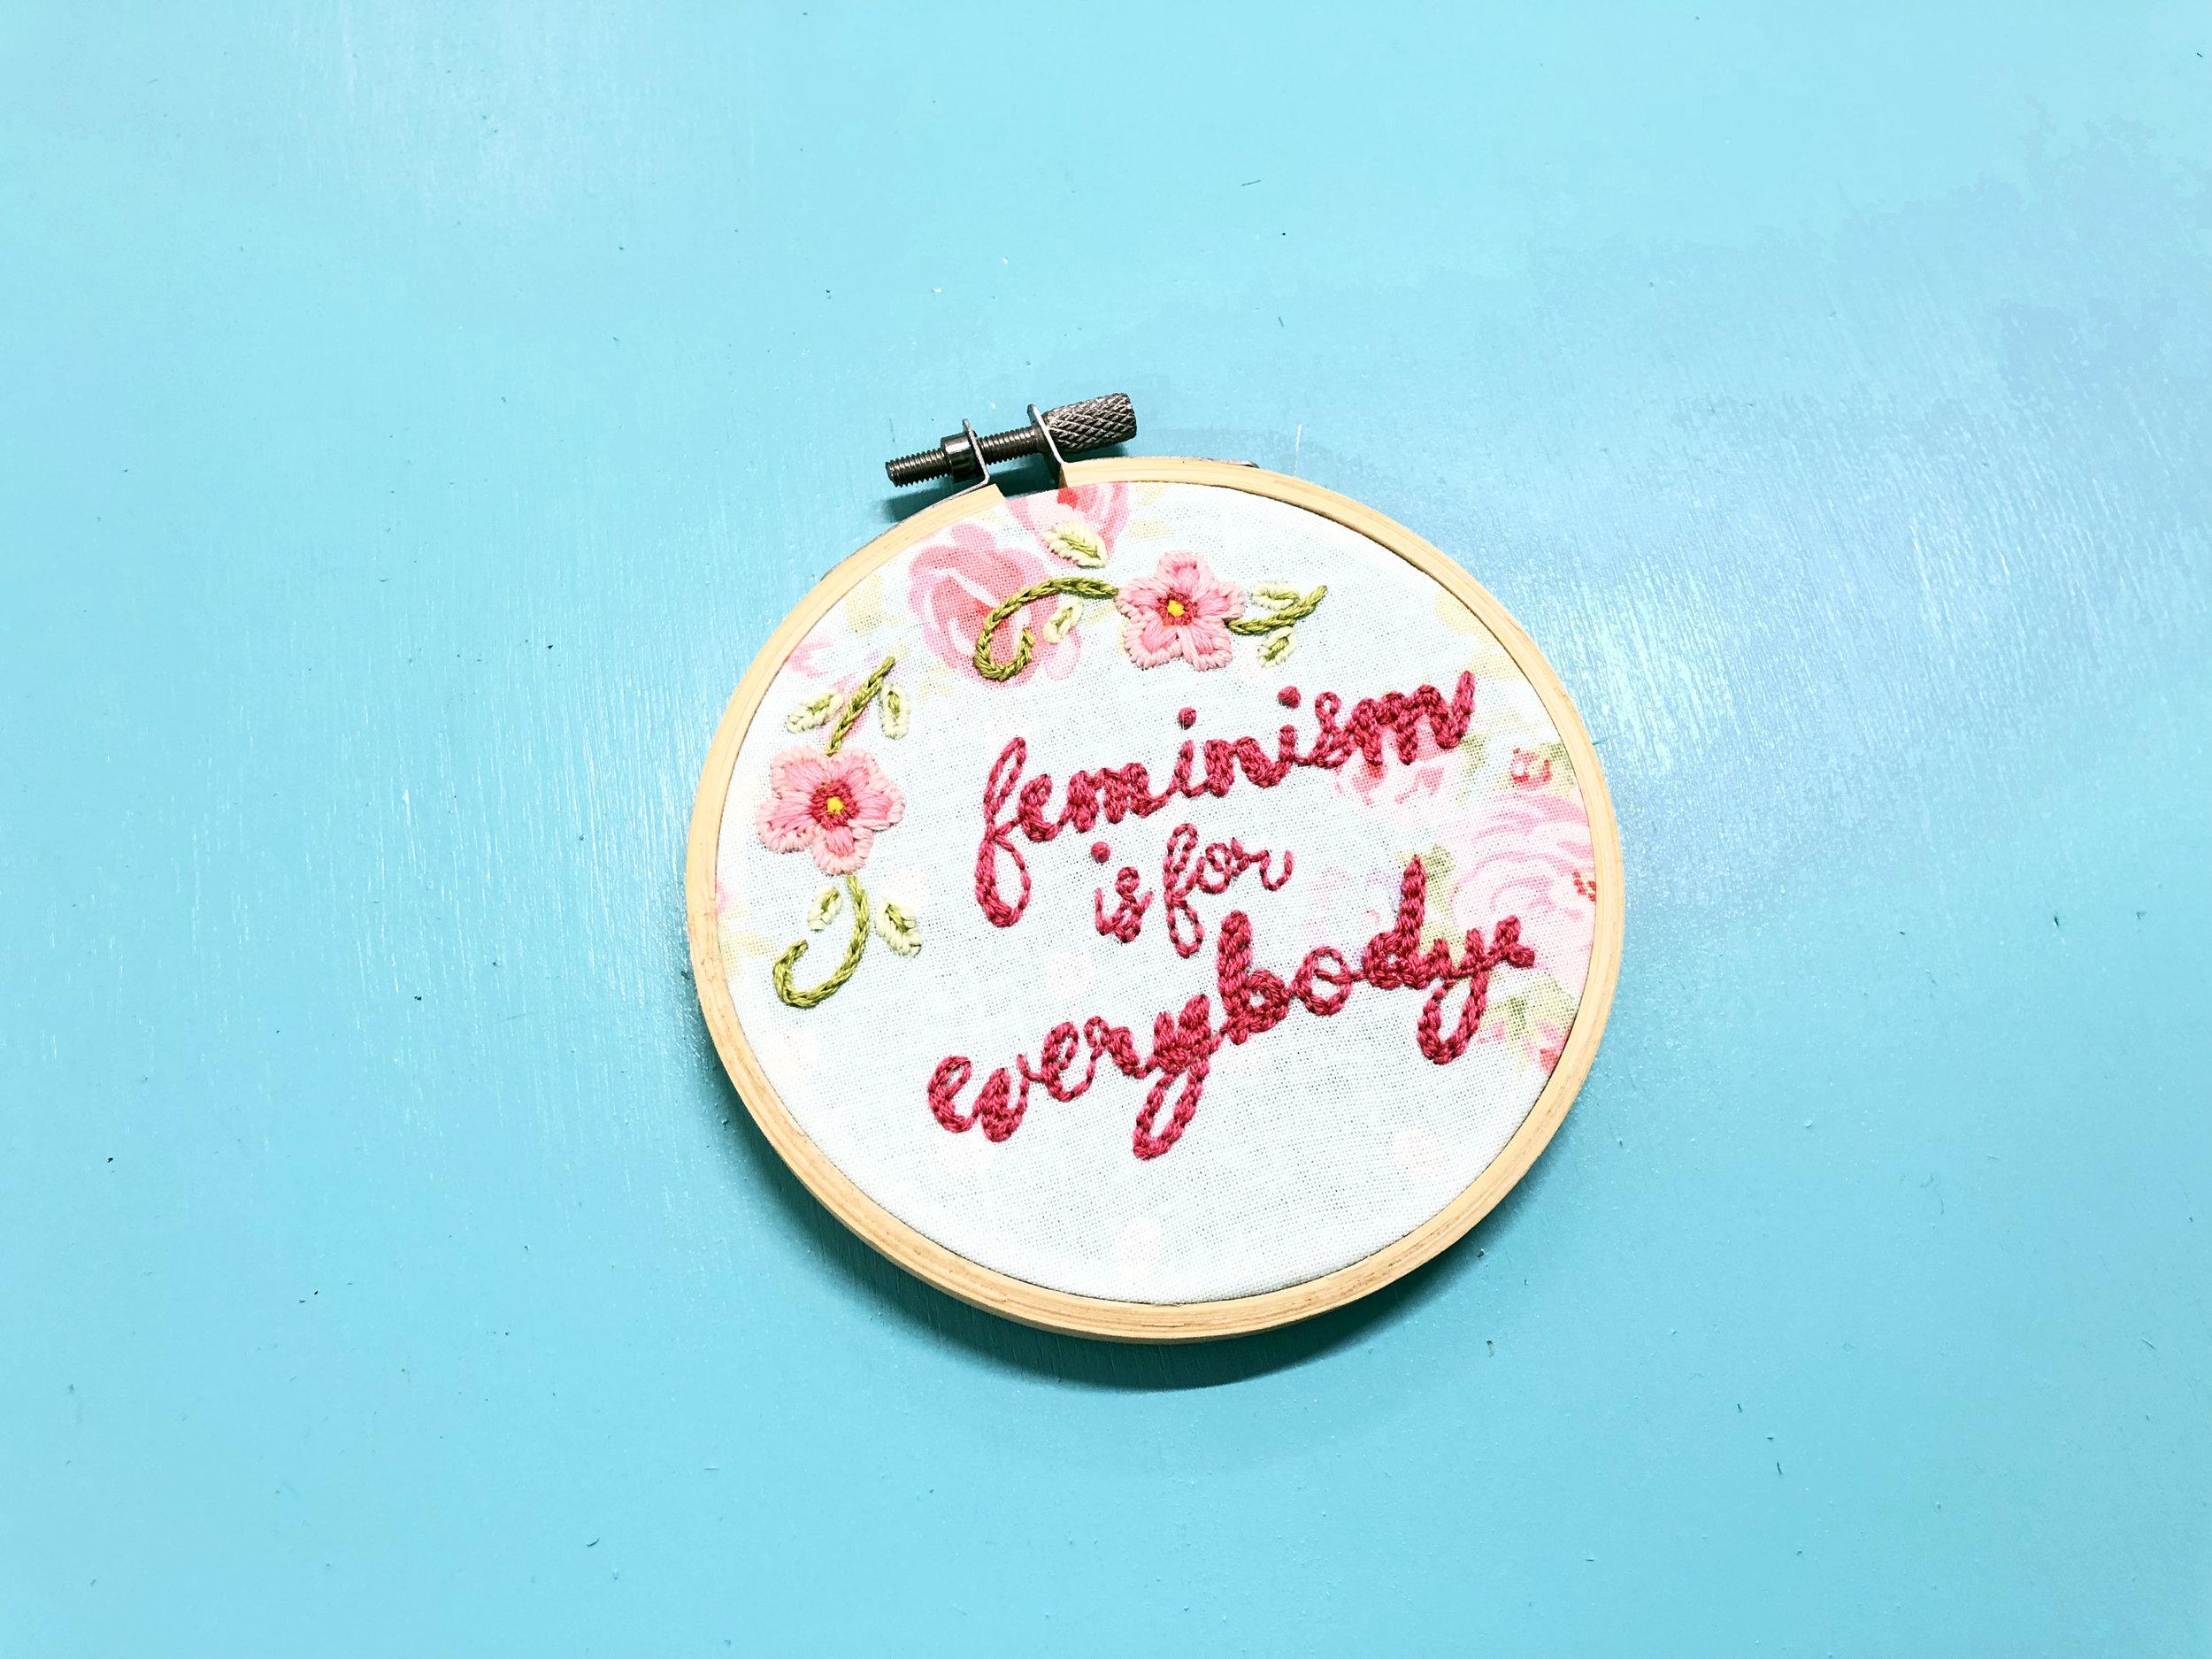 Feminism Stitch.jpg